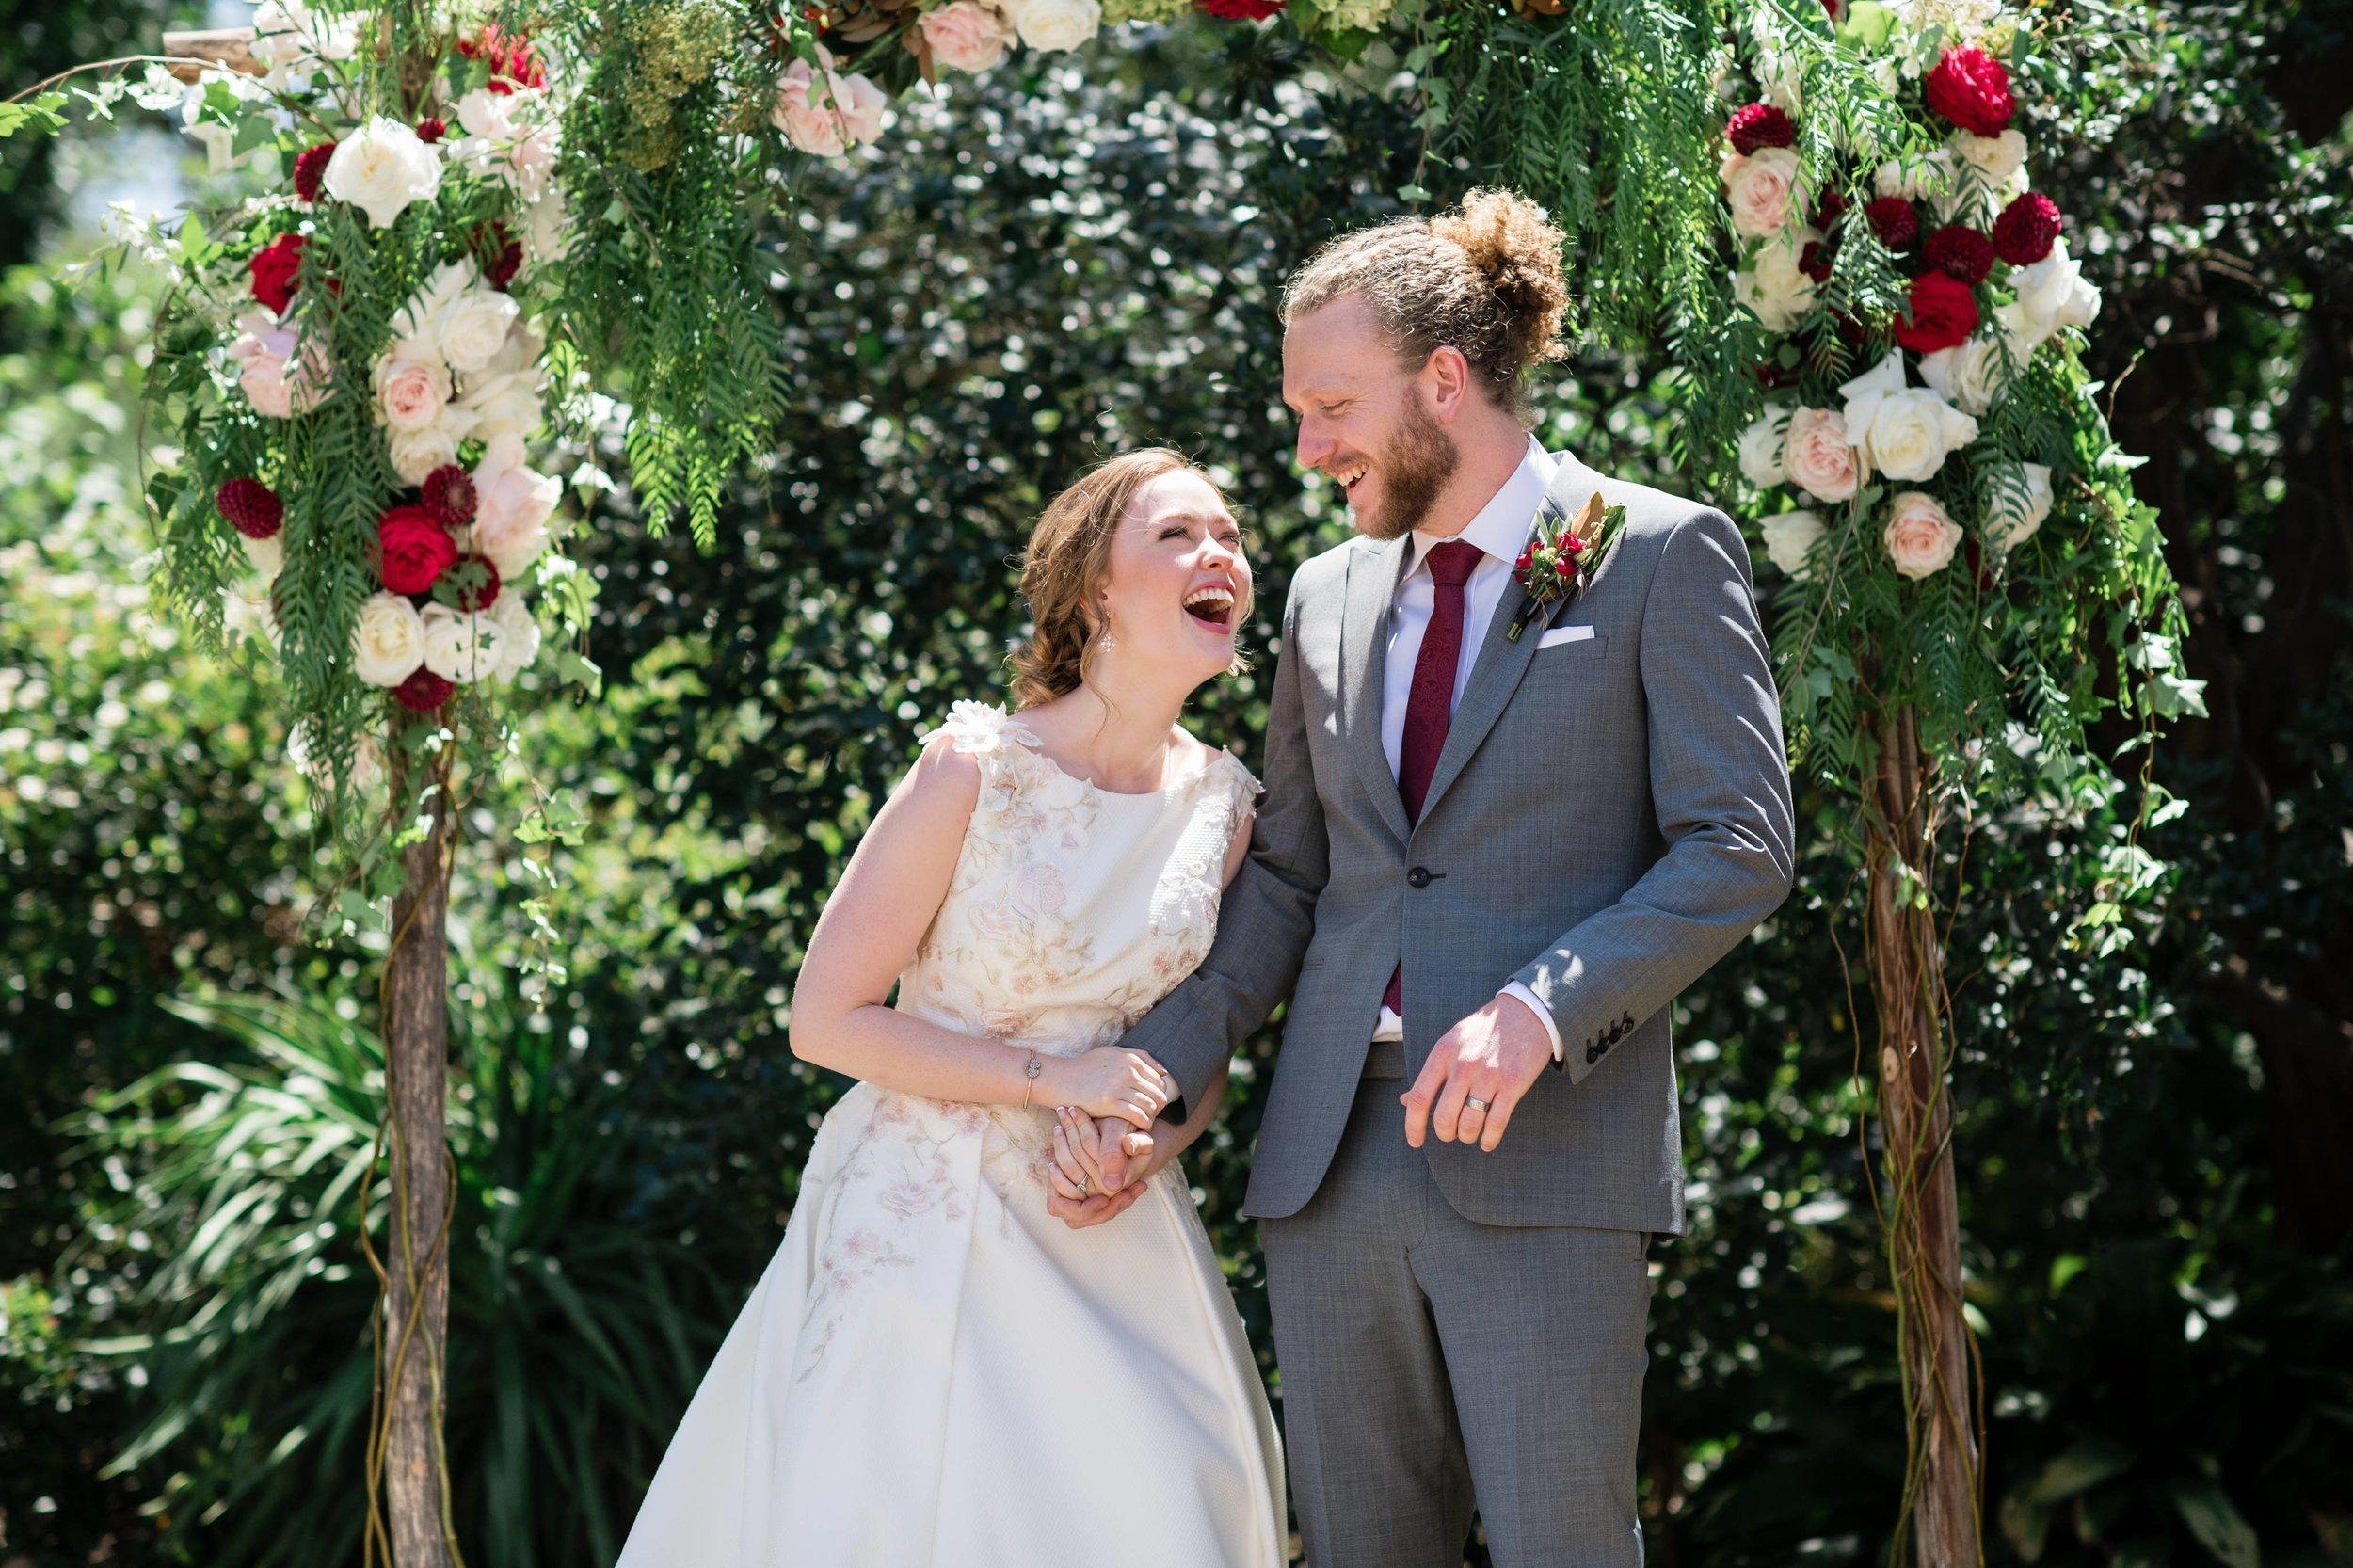 Post wedding kiss <3